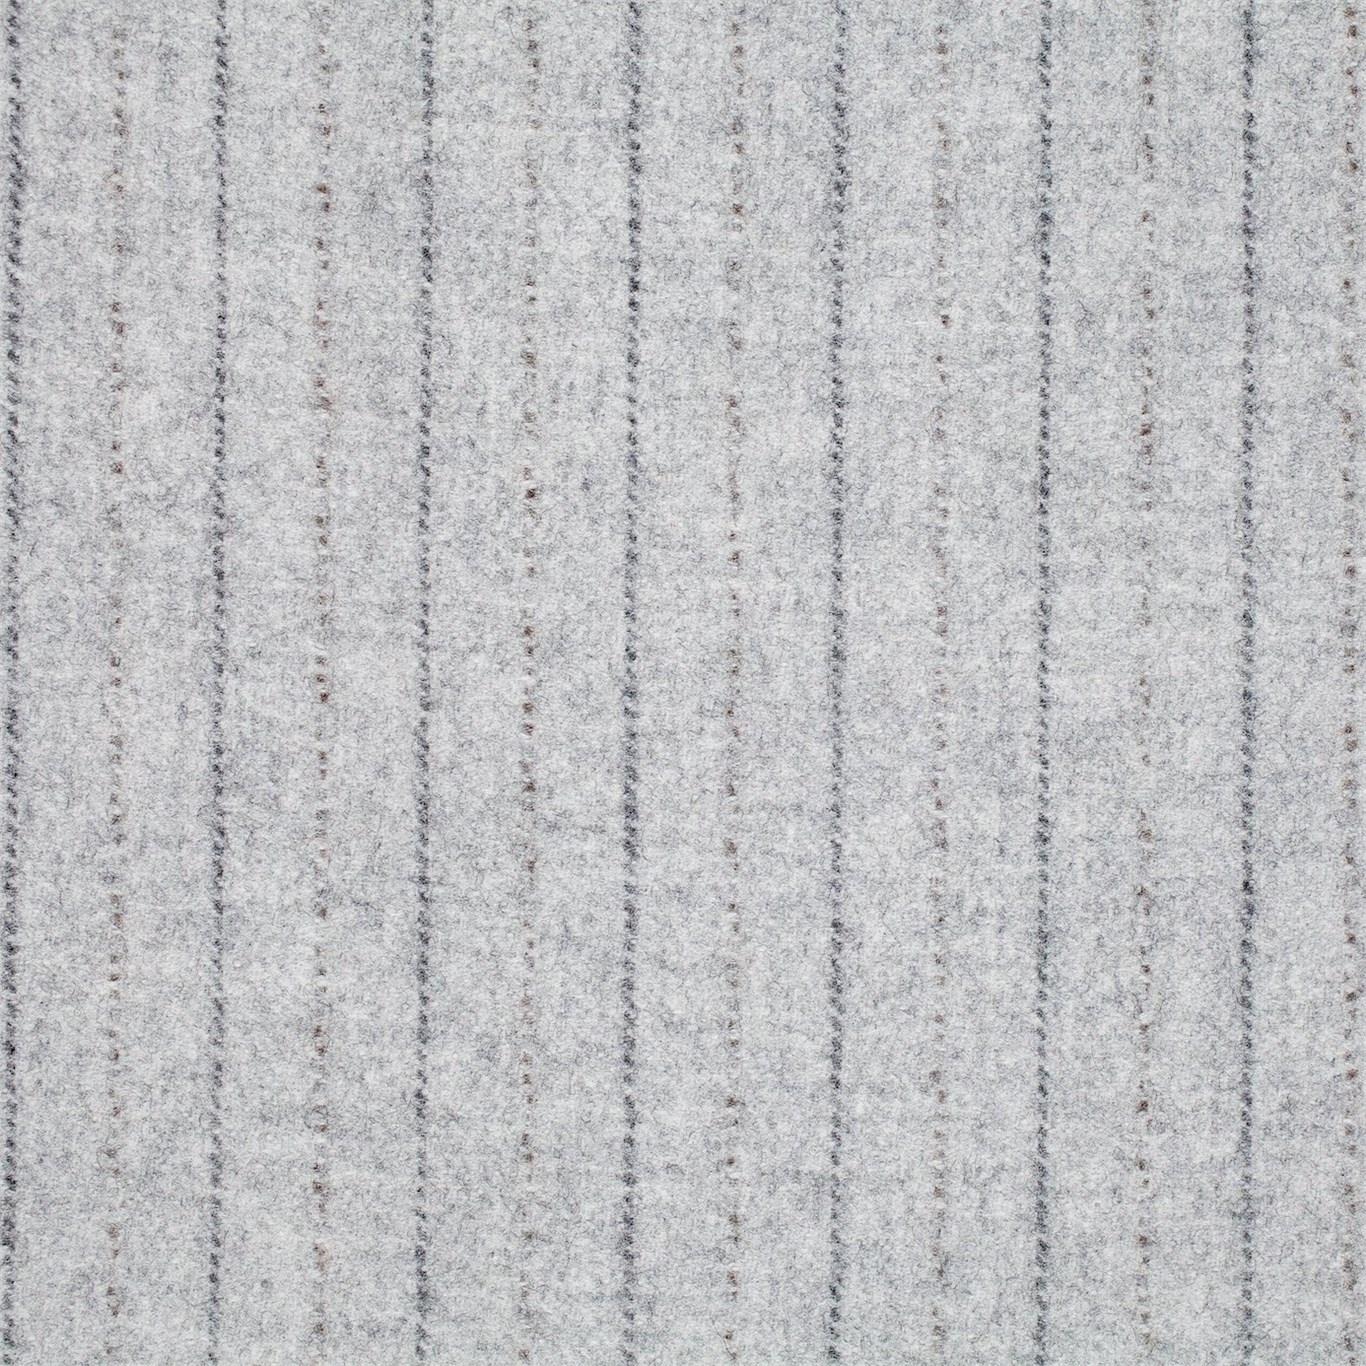 Image of Sanderson Tailor Flint Fabric 233256